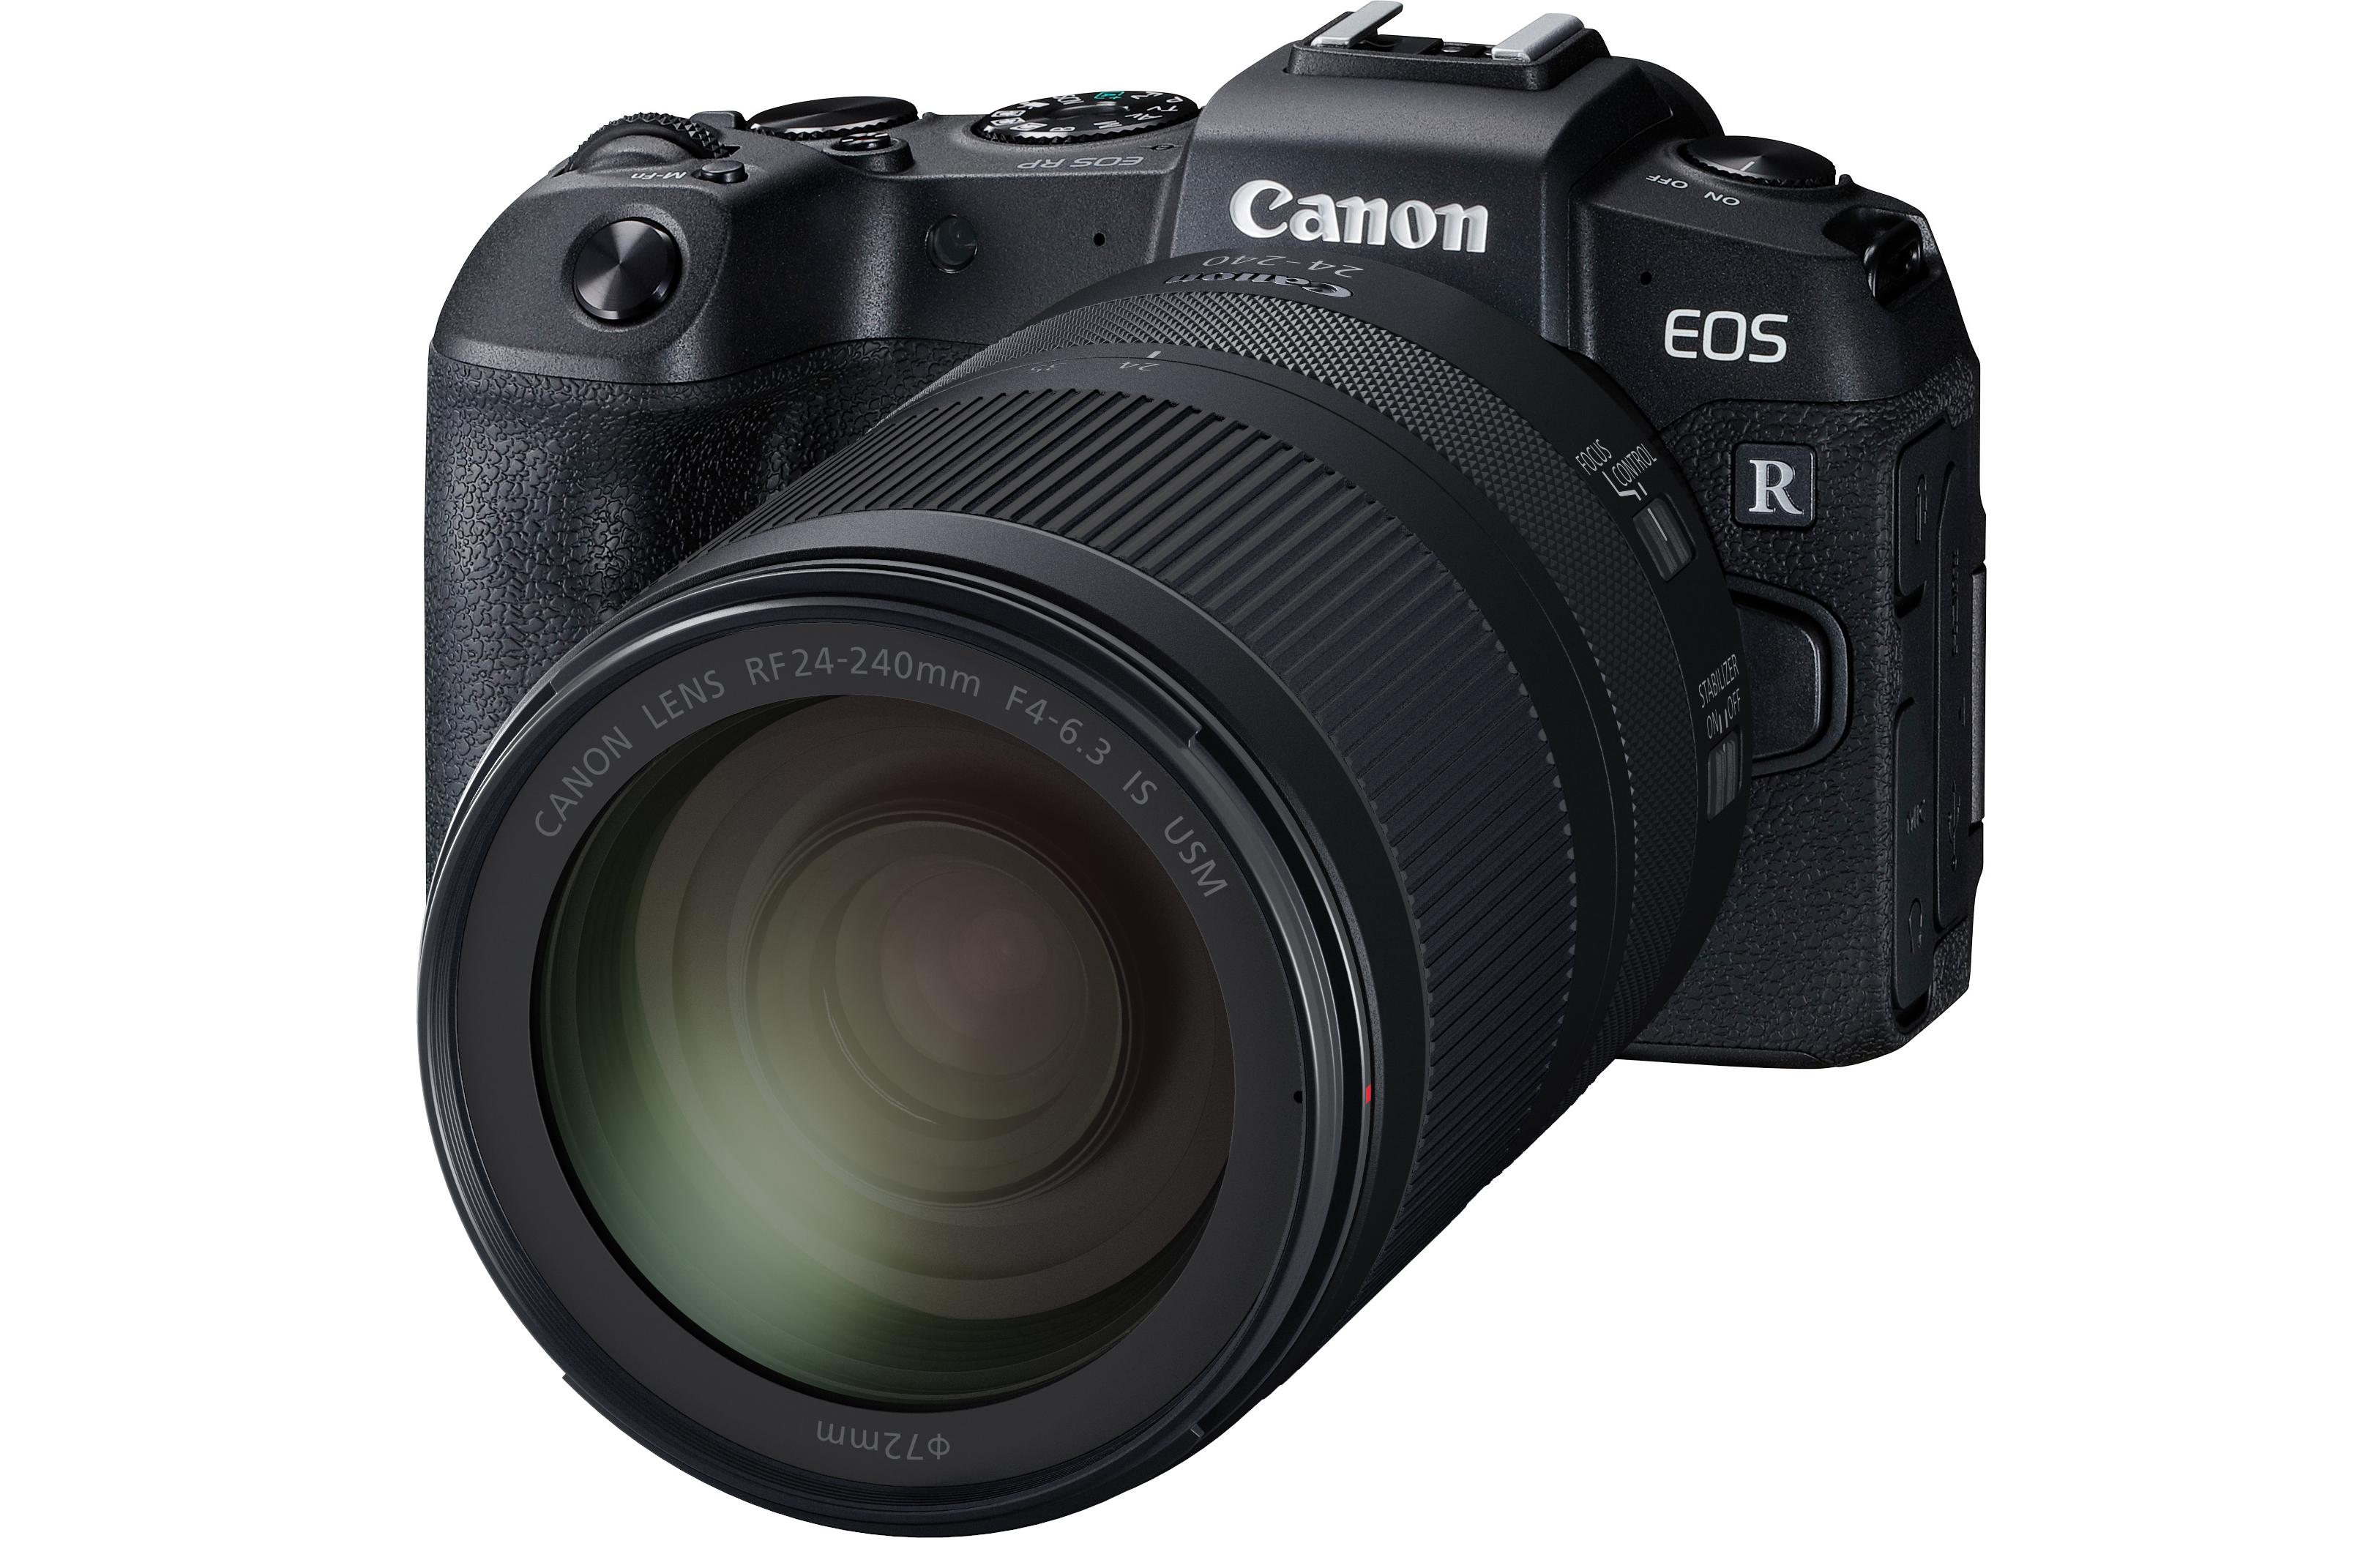 Canon Launch EOS RP Full-Frame Mirrorless Camera   ePHOTOzine